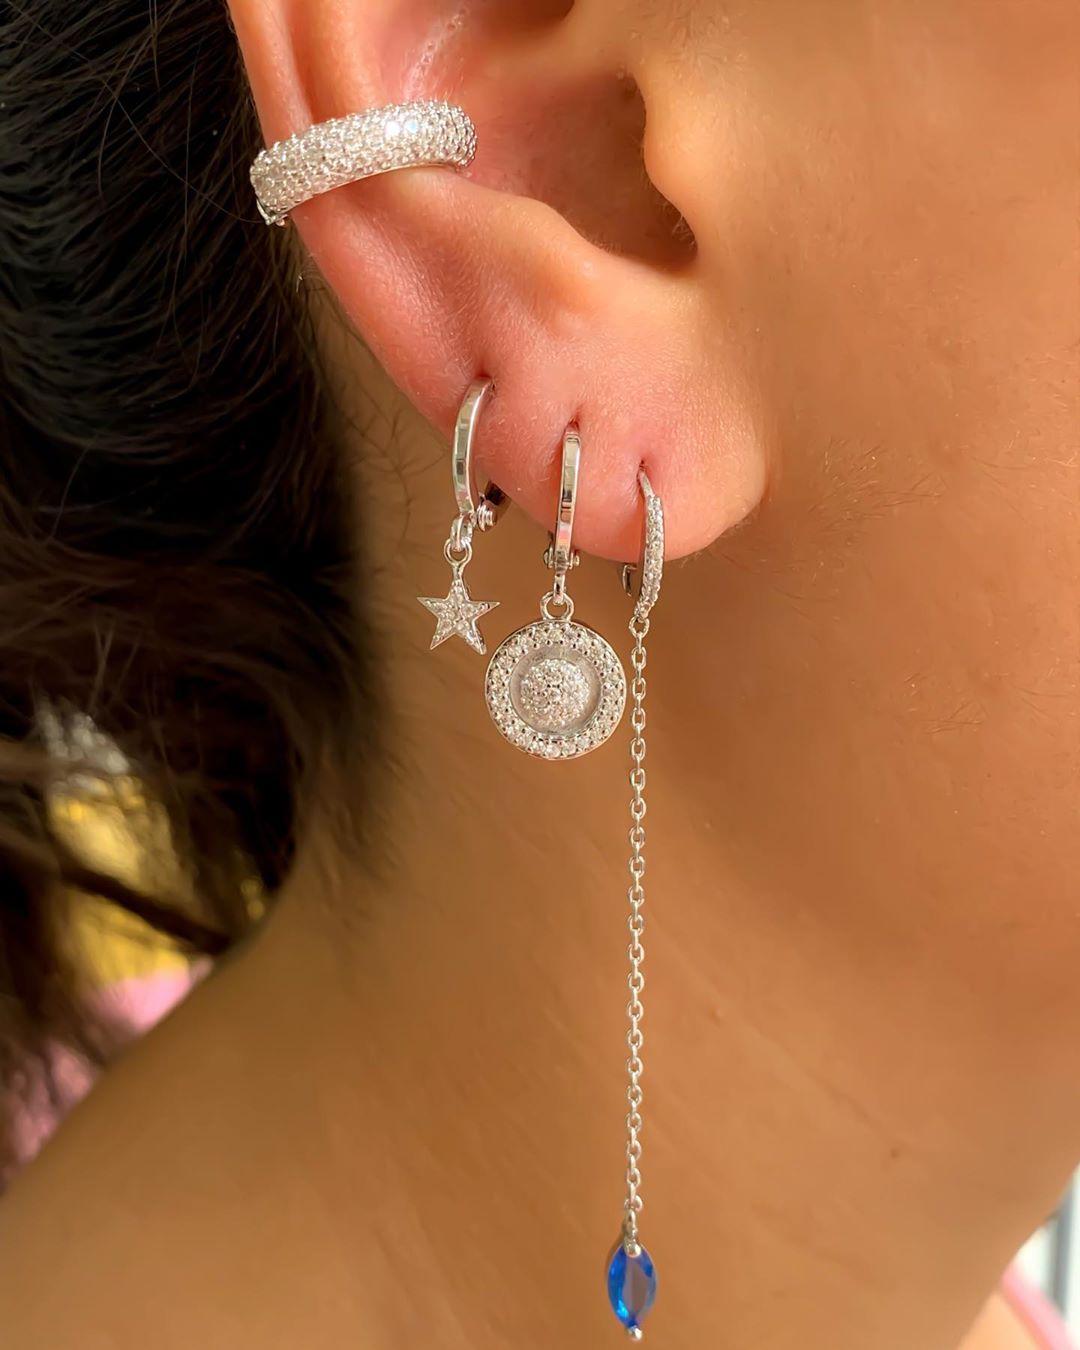 usar piercing fake luxuoso